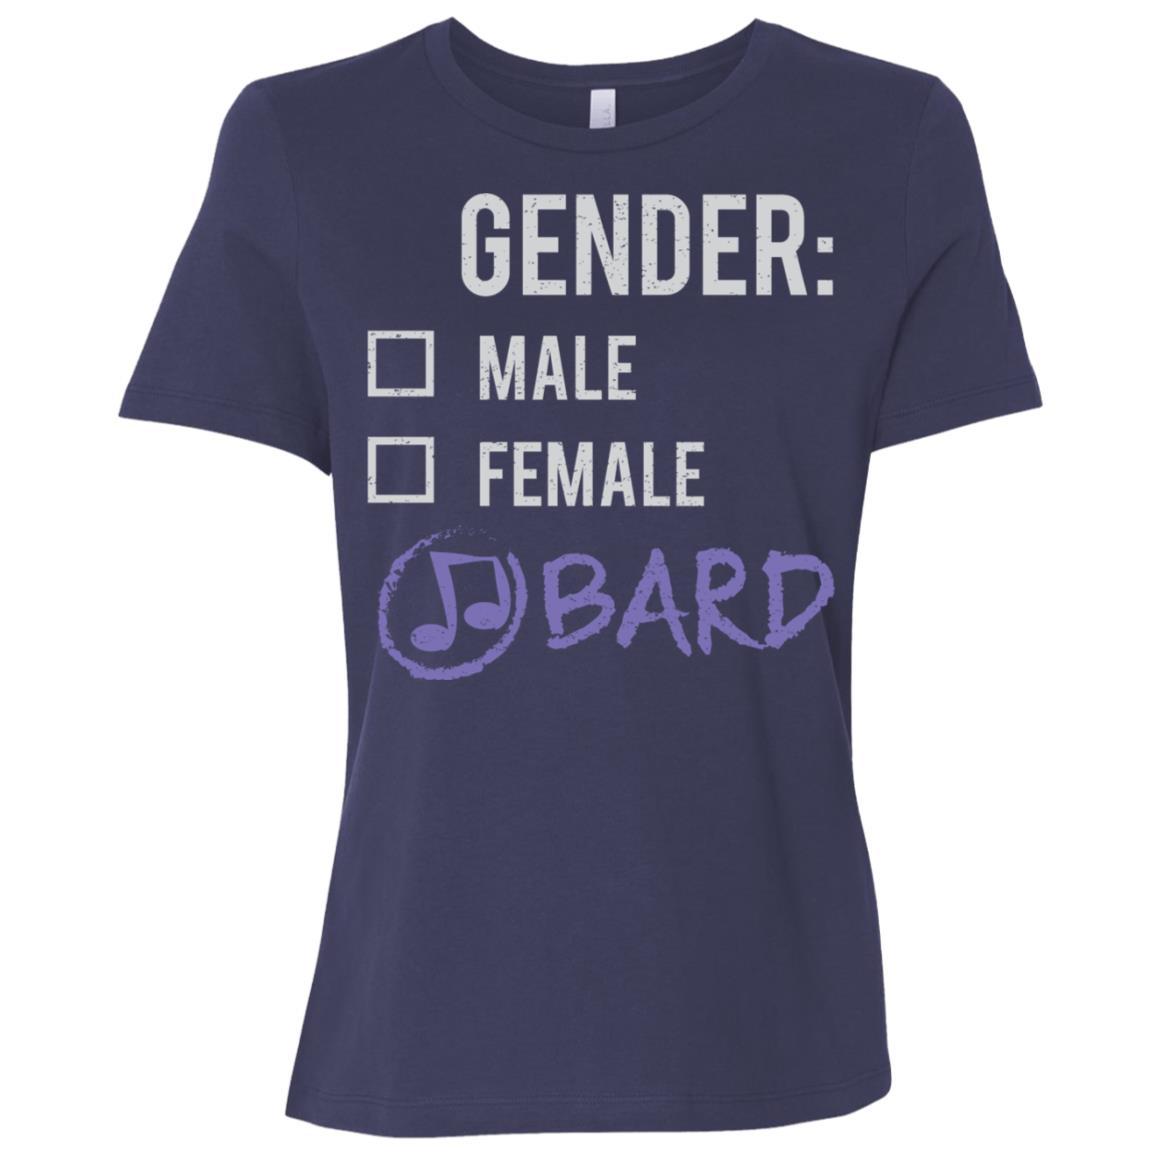 Male Female Bard Gender Nonbinary Trans Women Short Sleeve T-Shirt